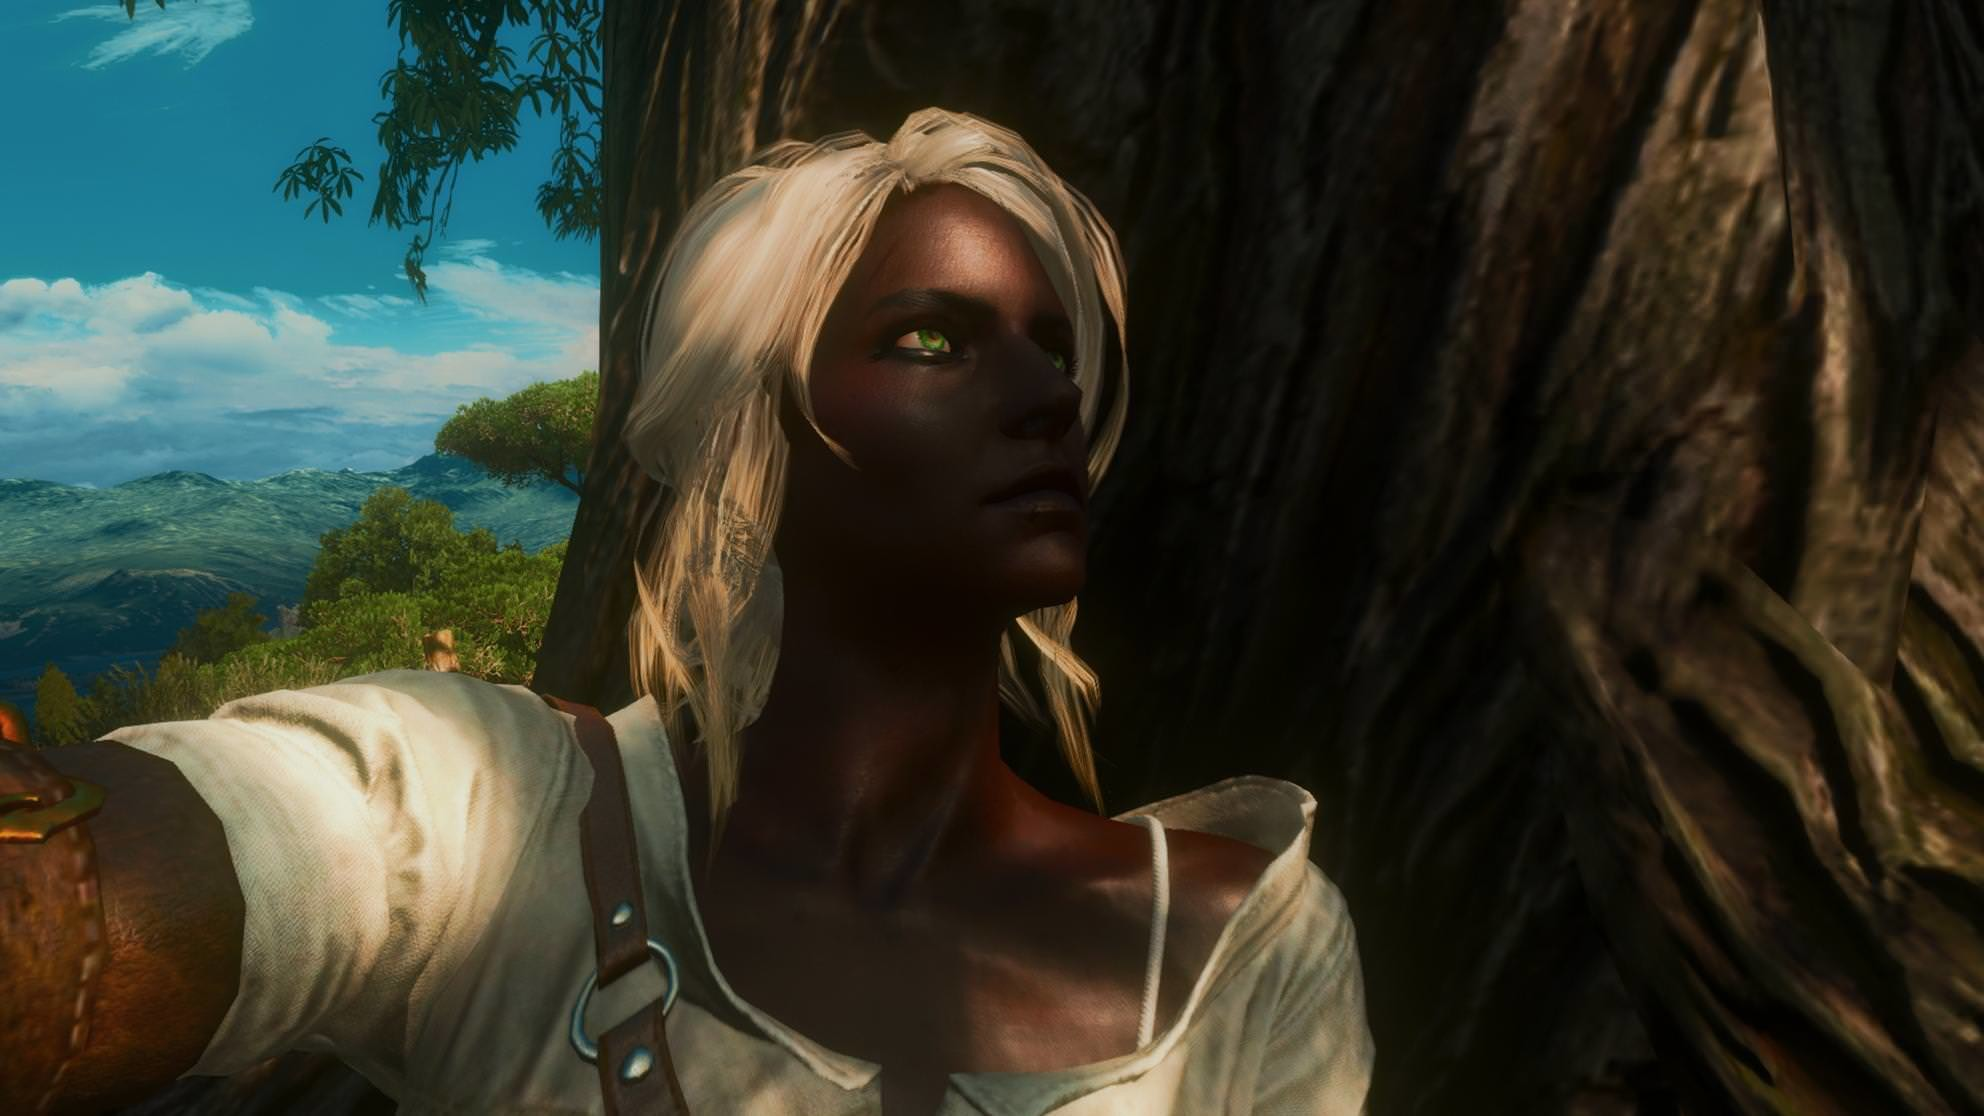 Recent Netflix backlash prompted a black Ciri Mod for Witcher 3